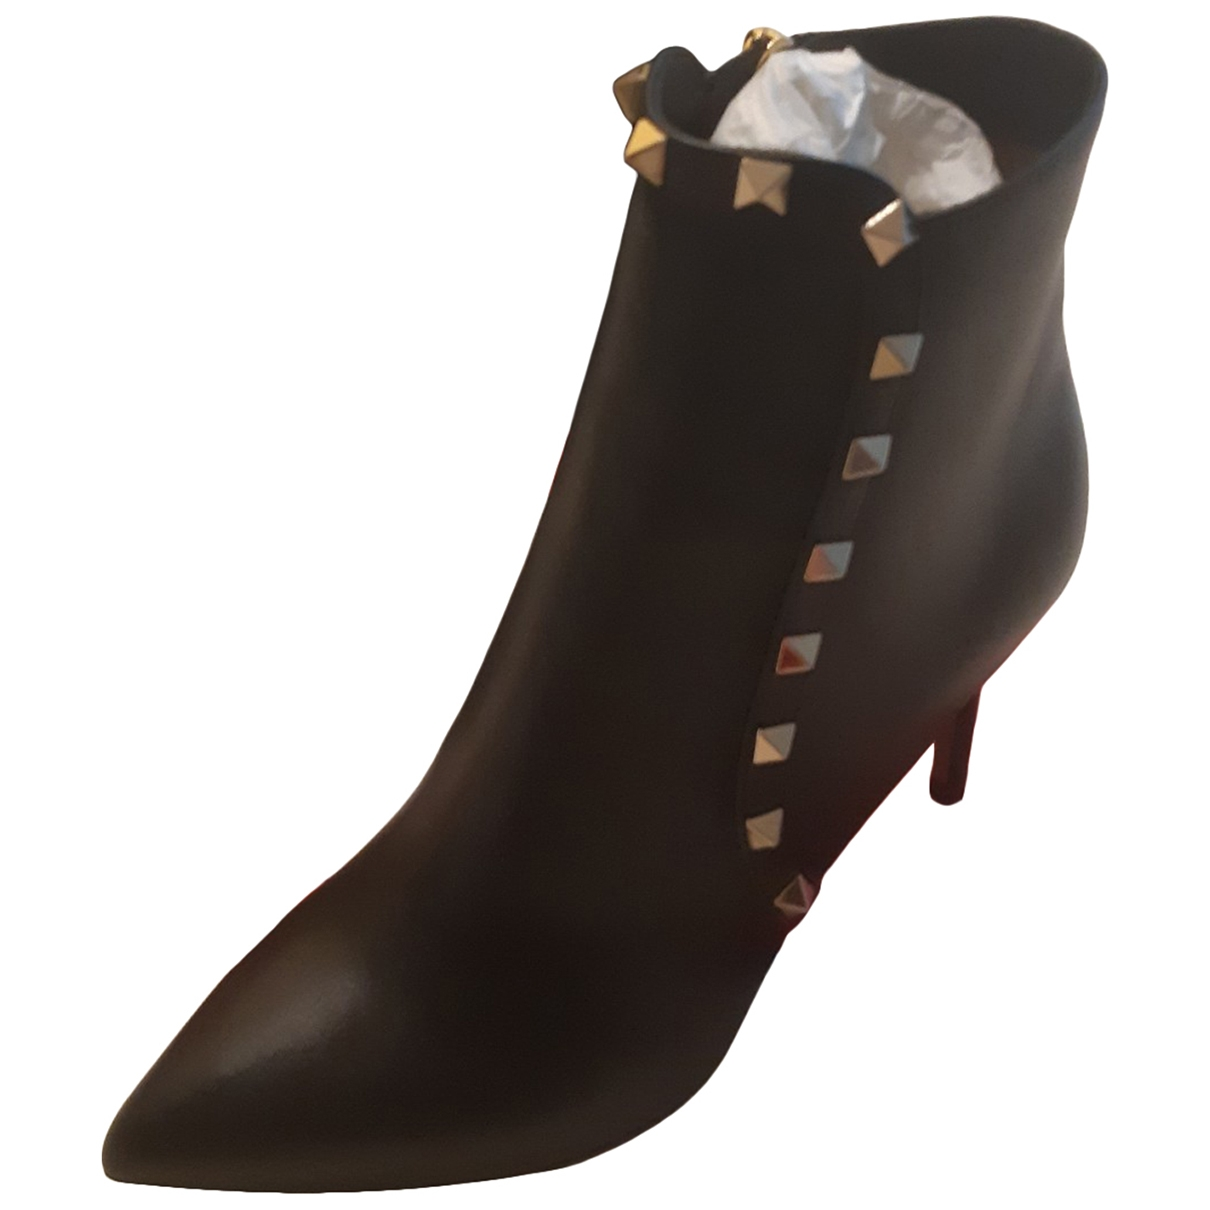 Valentino Garavani Rockstud Black Leather Ankle boots for Women 37 EU